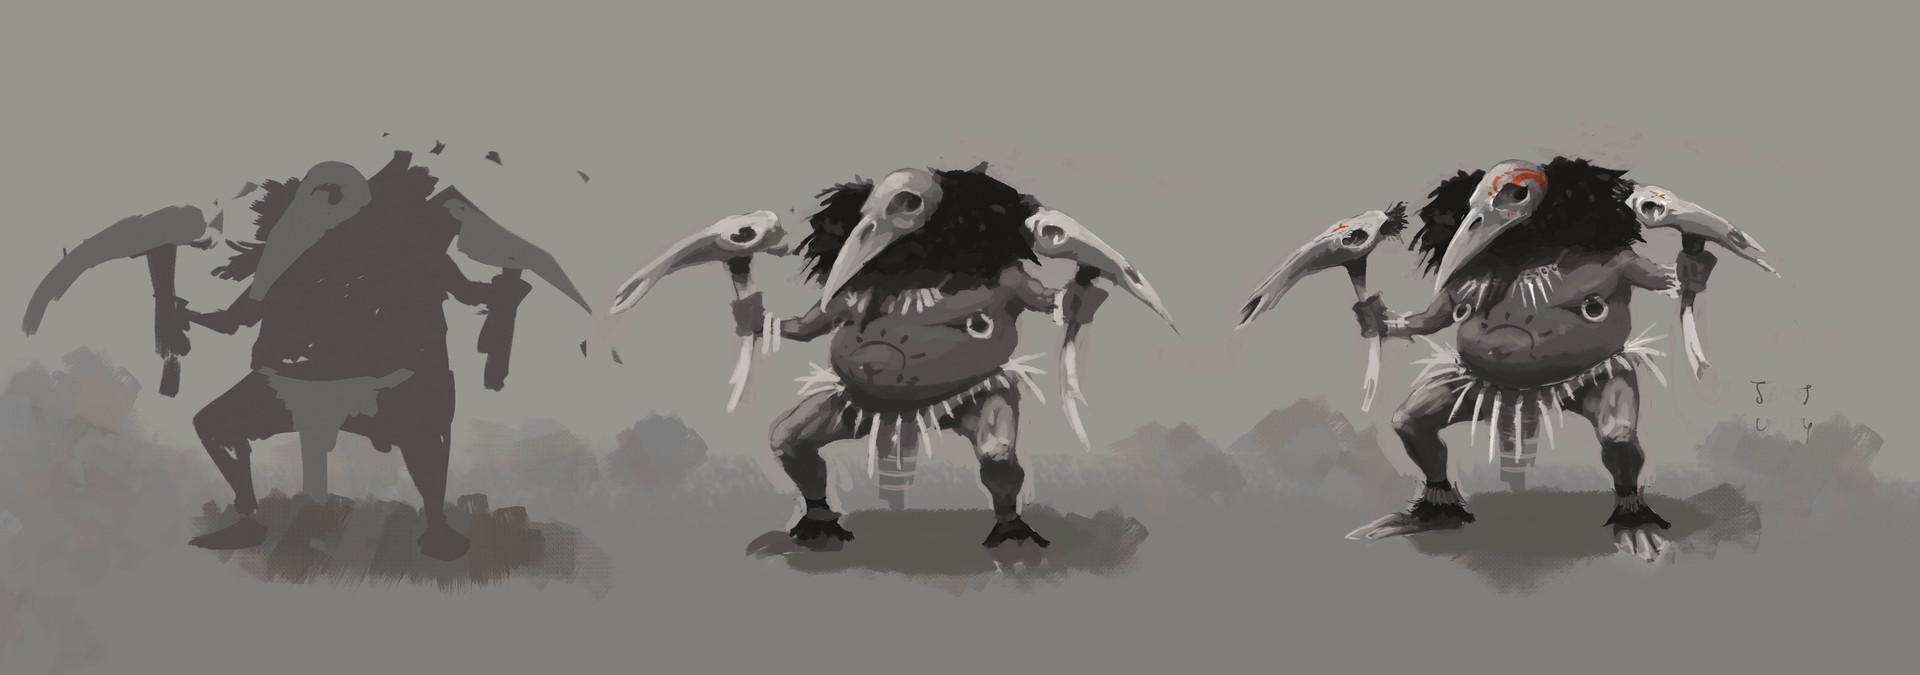 Crowwarrior concept